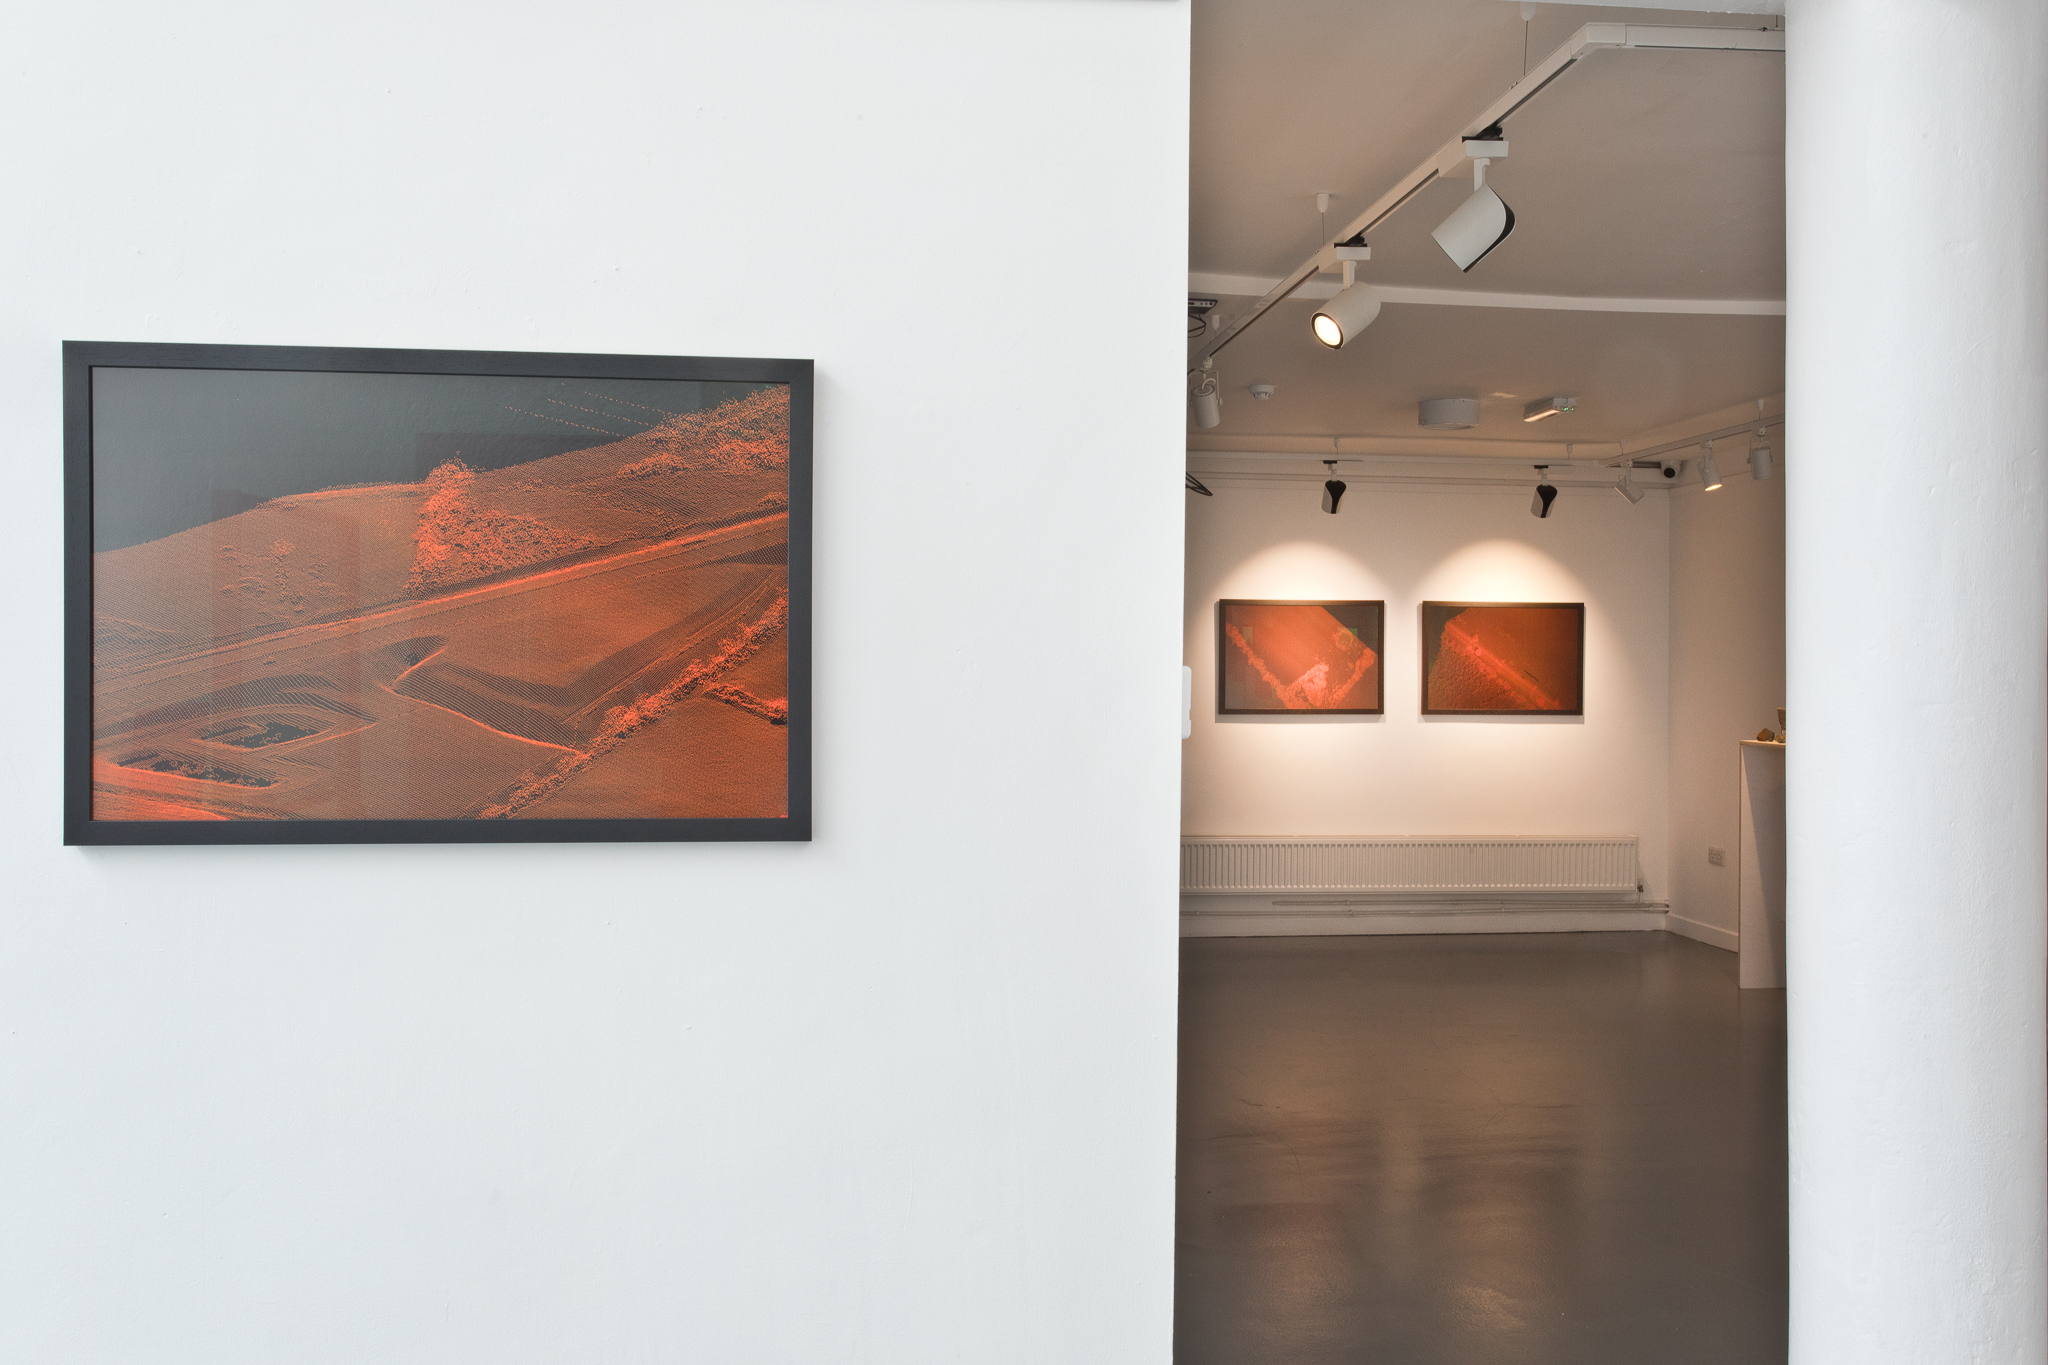 Martina O'Brien, Legacy Plots,2021, Ultra-chrome prints, series of 3. Dimensions : 84cmx55.5cm